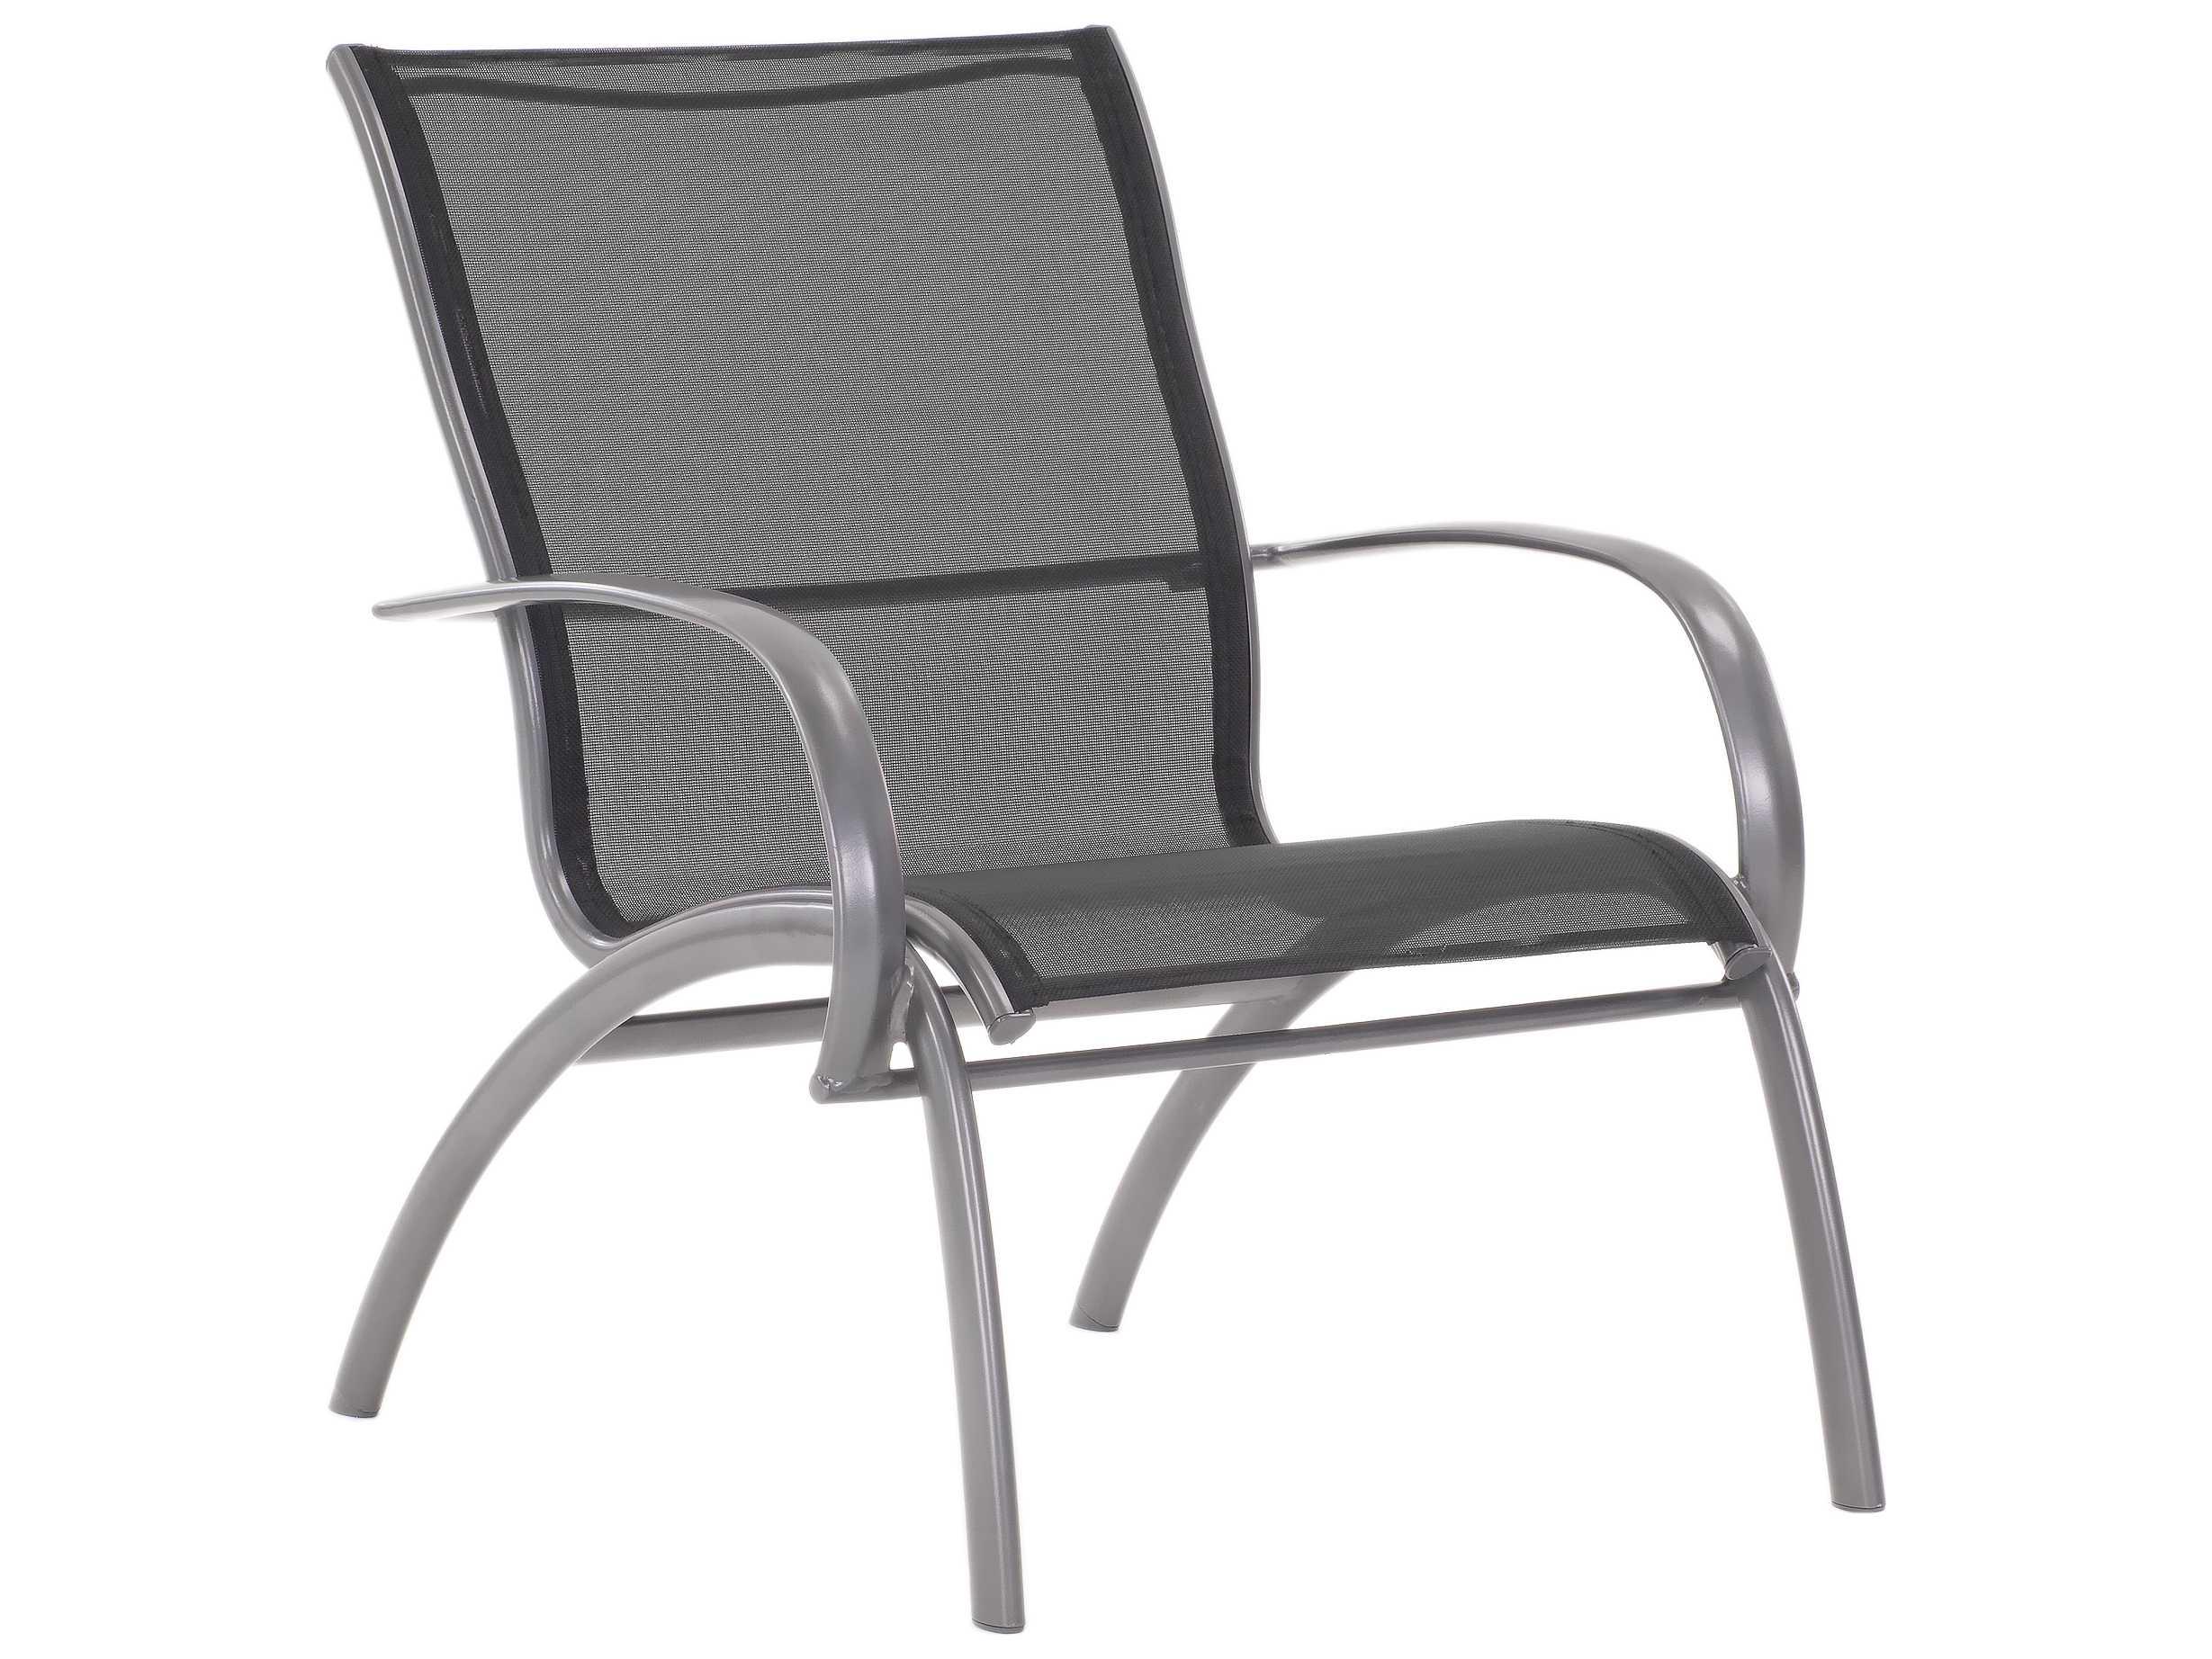 Koverton Modone Aluminum Lounge Chair